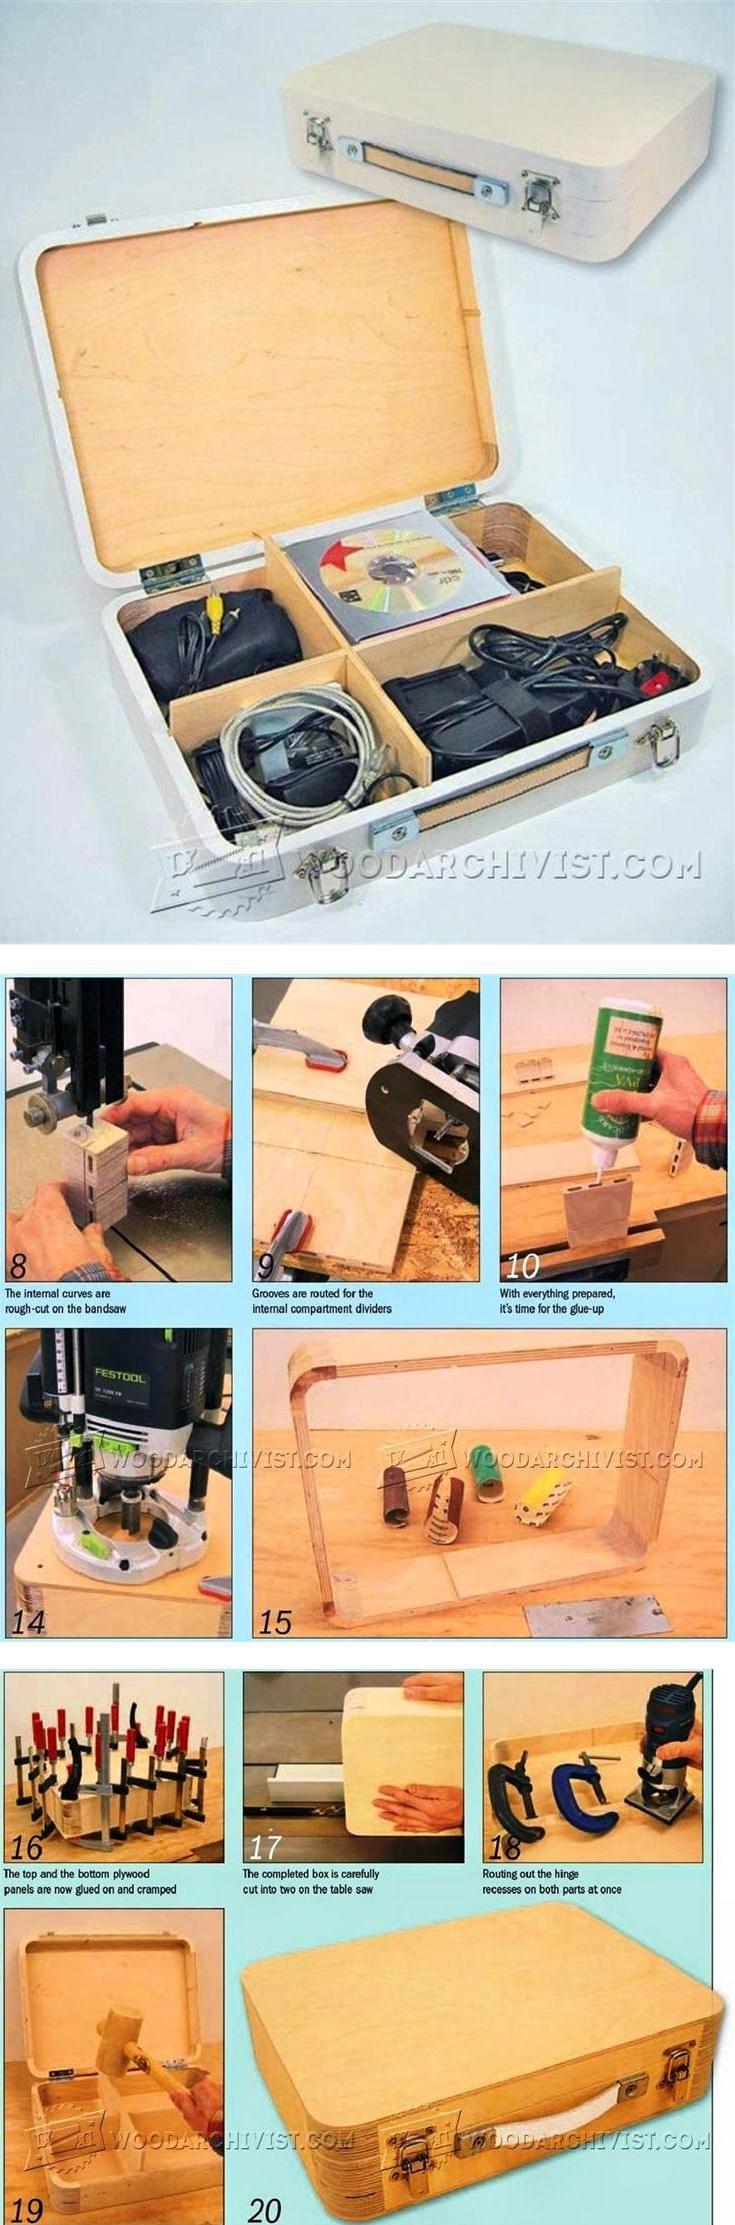 Wooden Attache Case Plans - Woodworking Plans and Projects | WoodArchivist.com